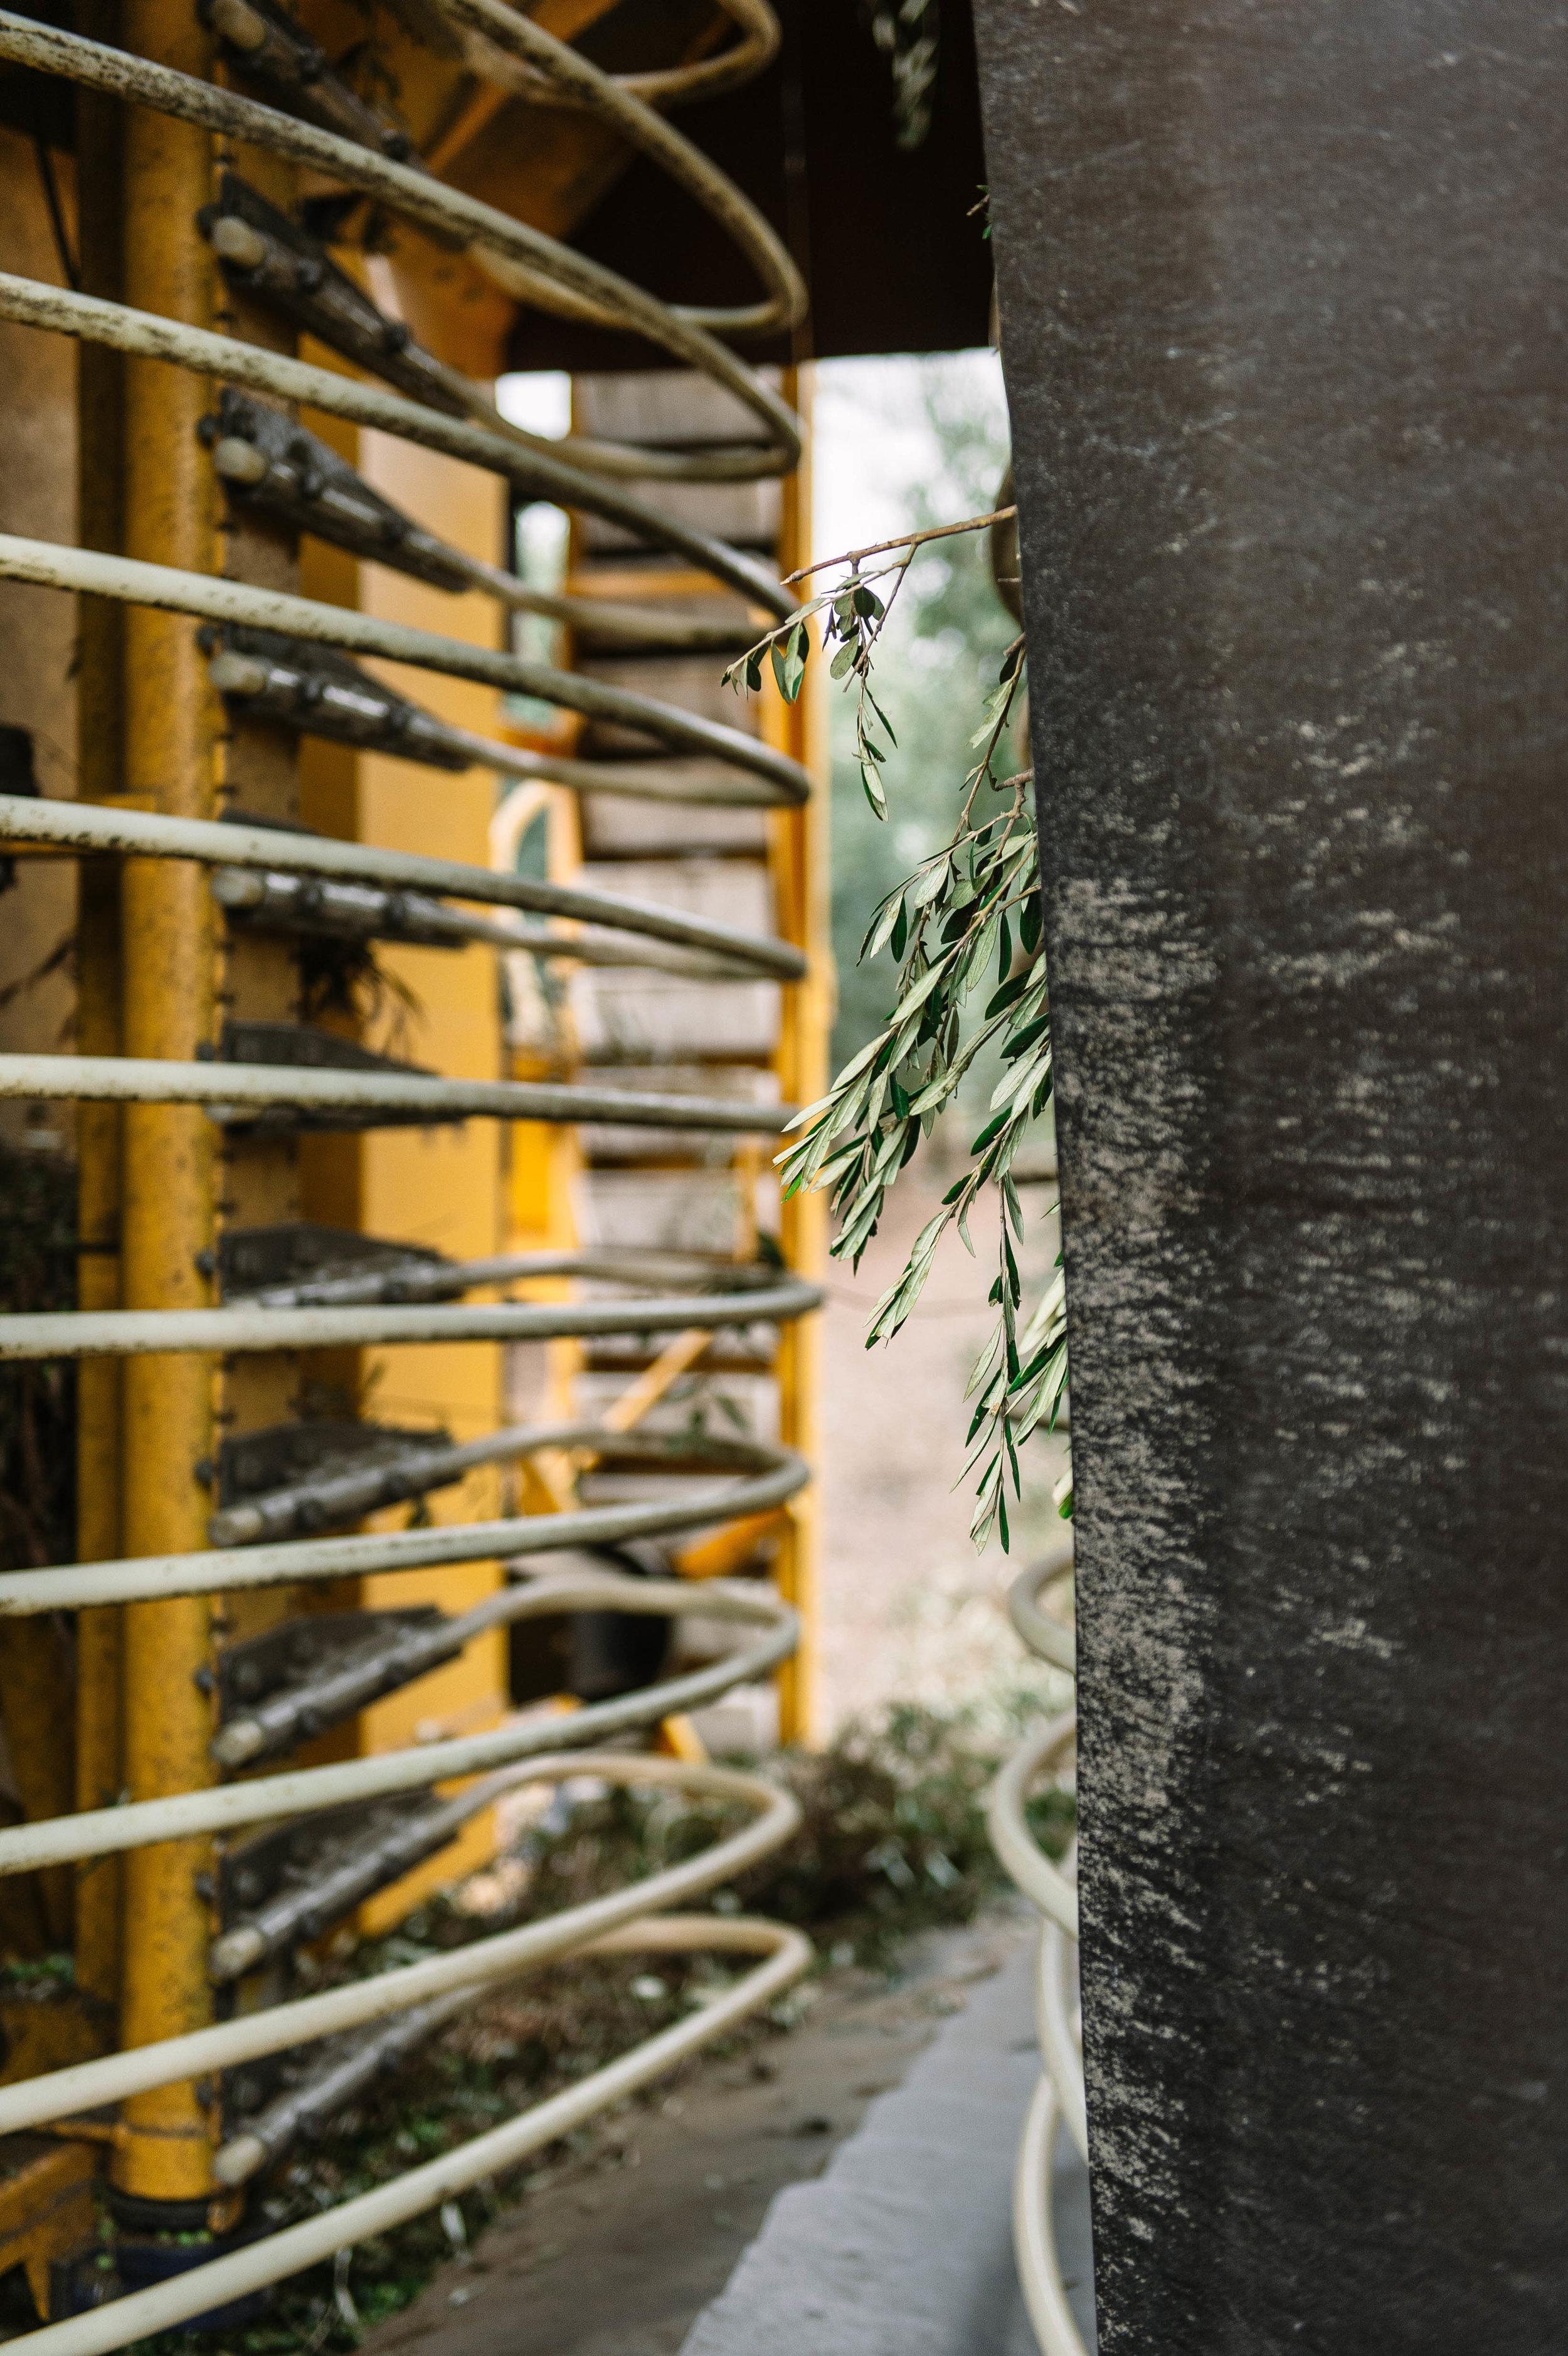 Olive harvesting equipment